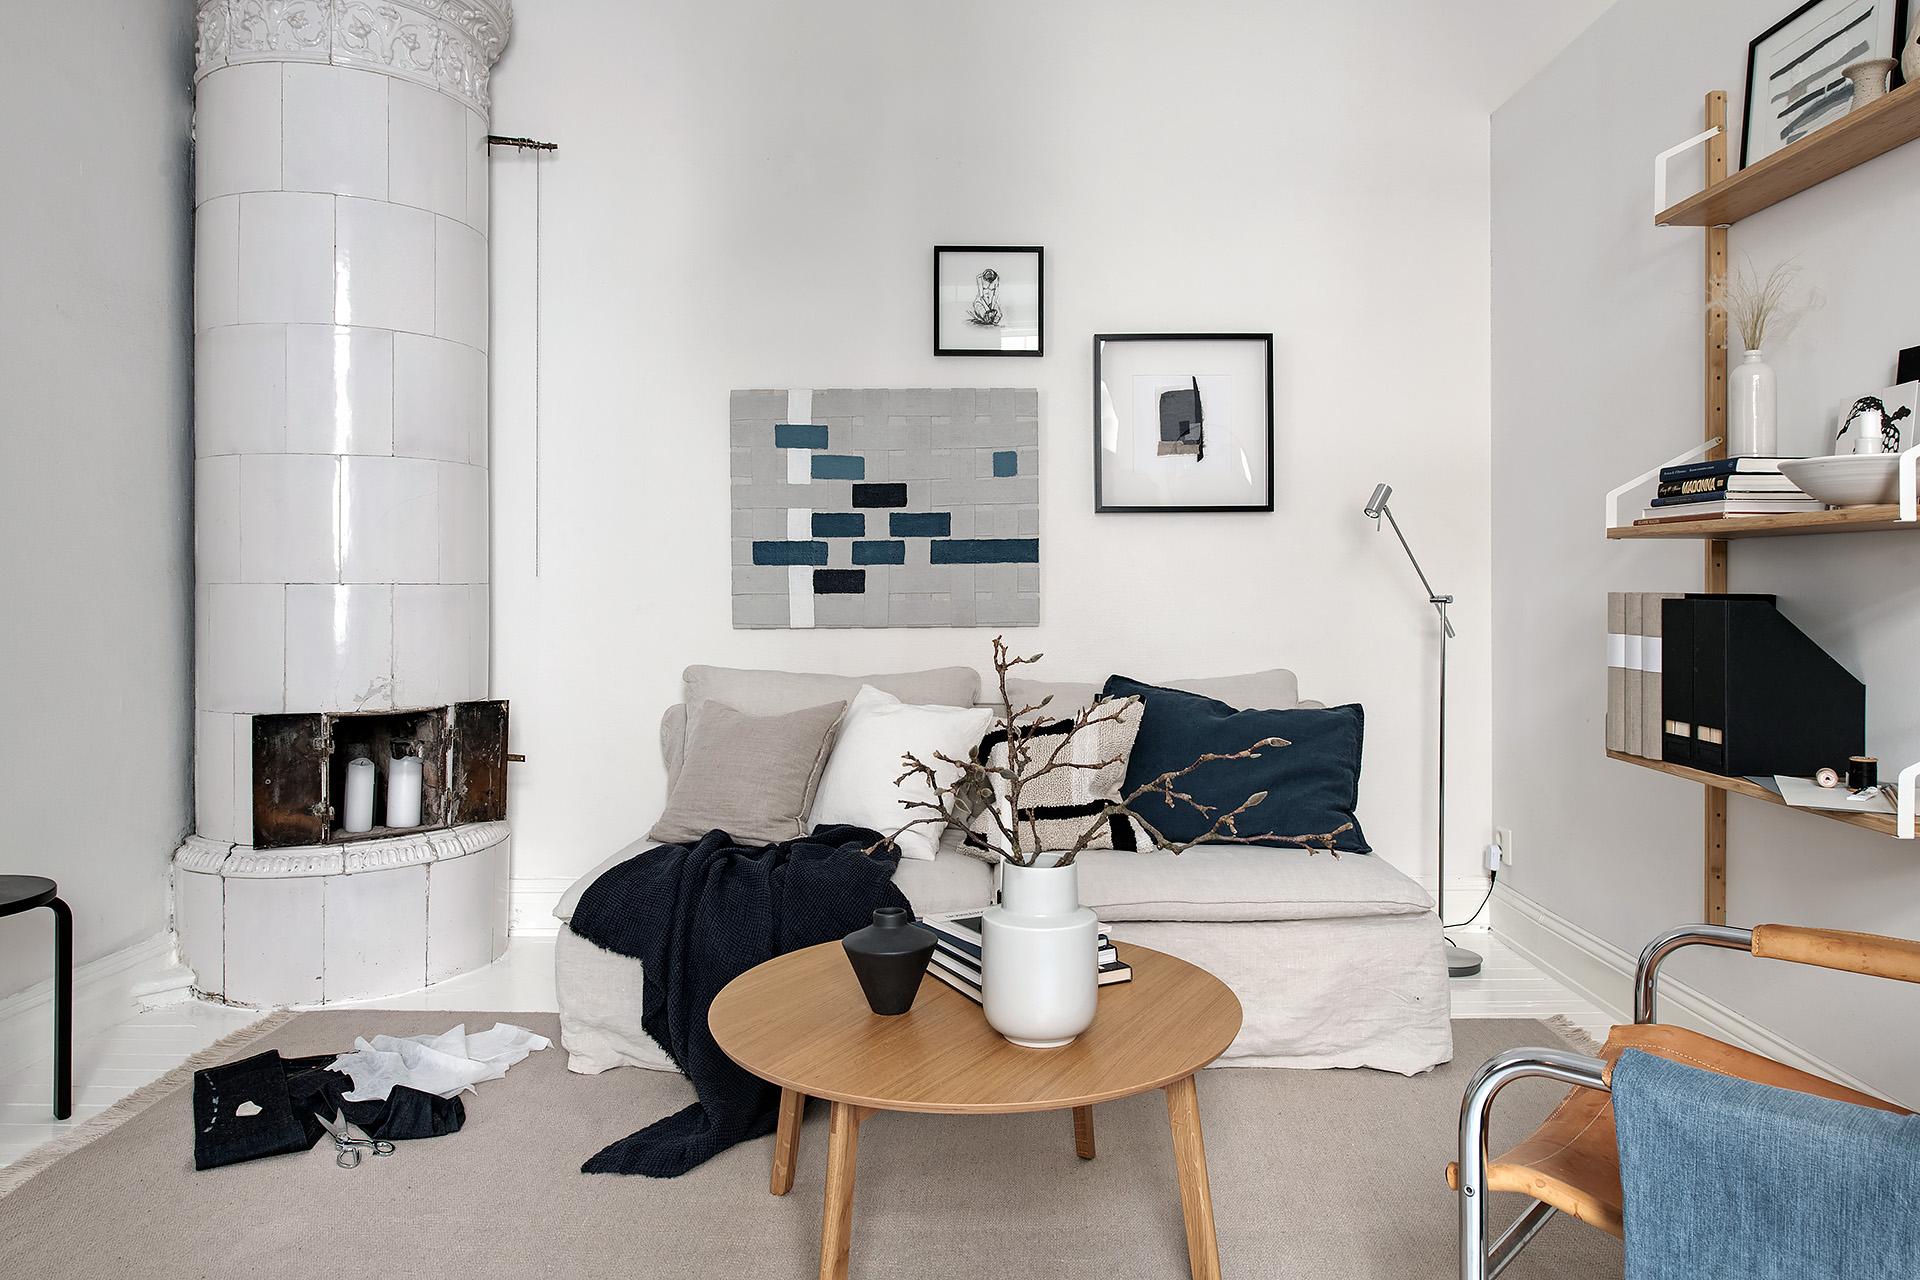 Modern living room with blue denim accents / via @kronekernModern living room with blue denim accents / via @kronekern